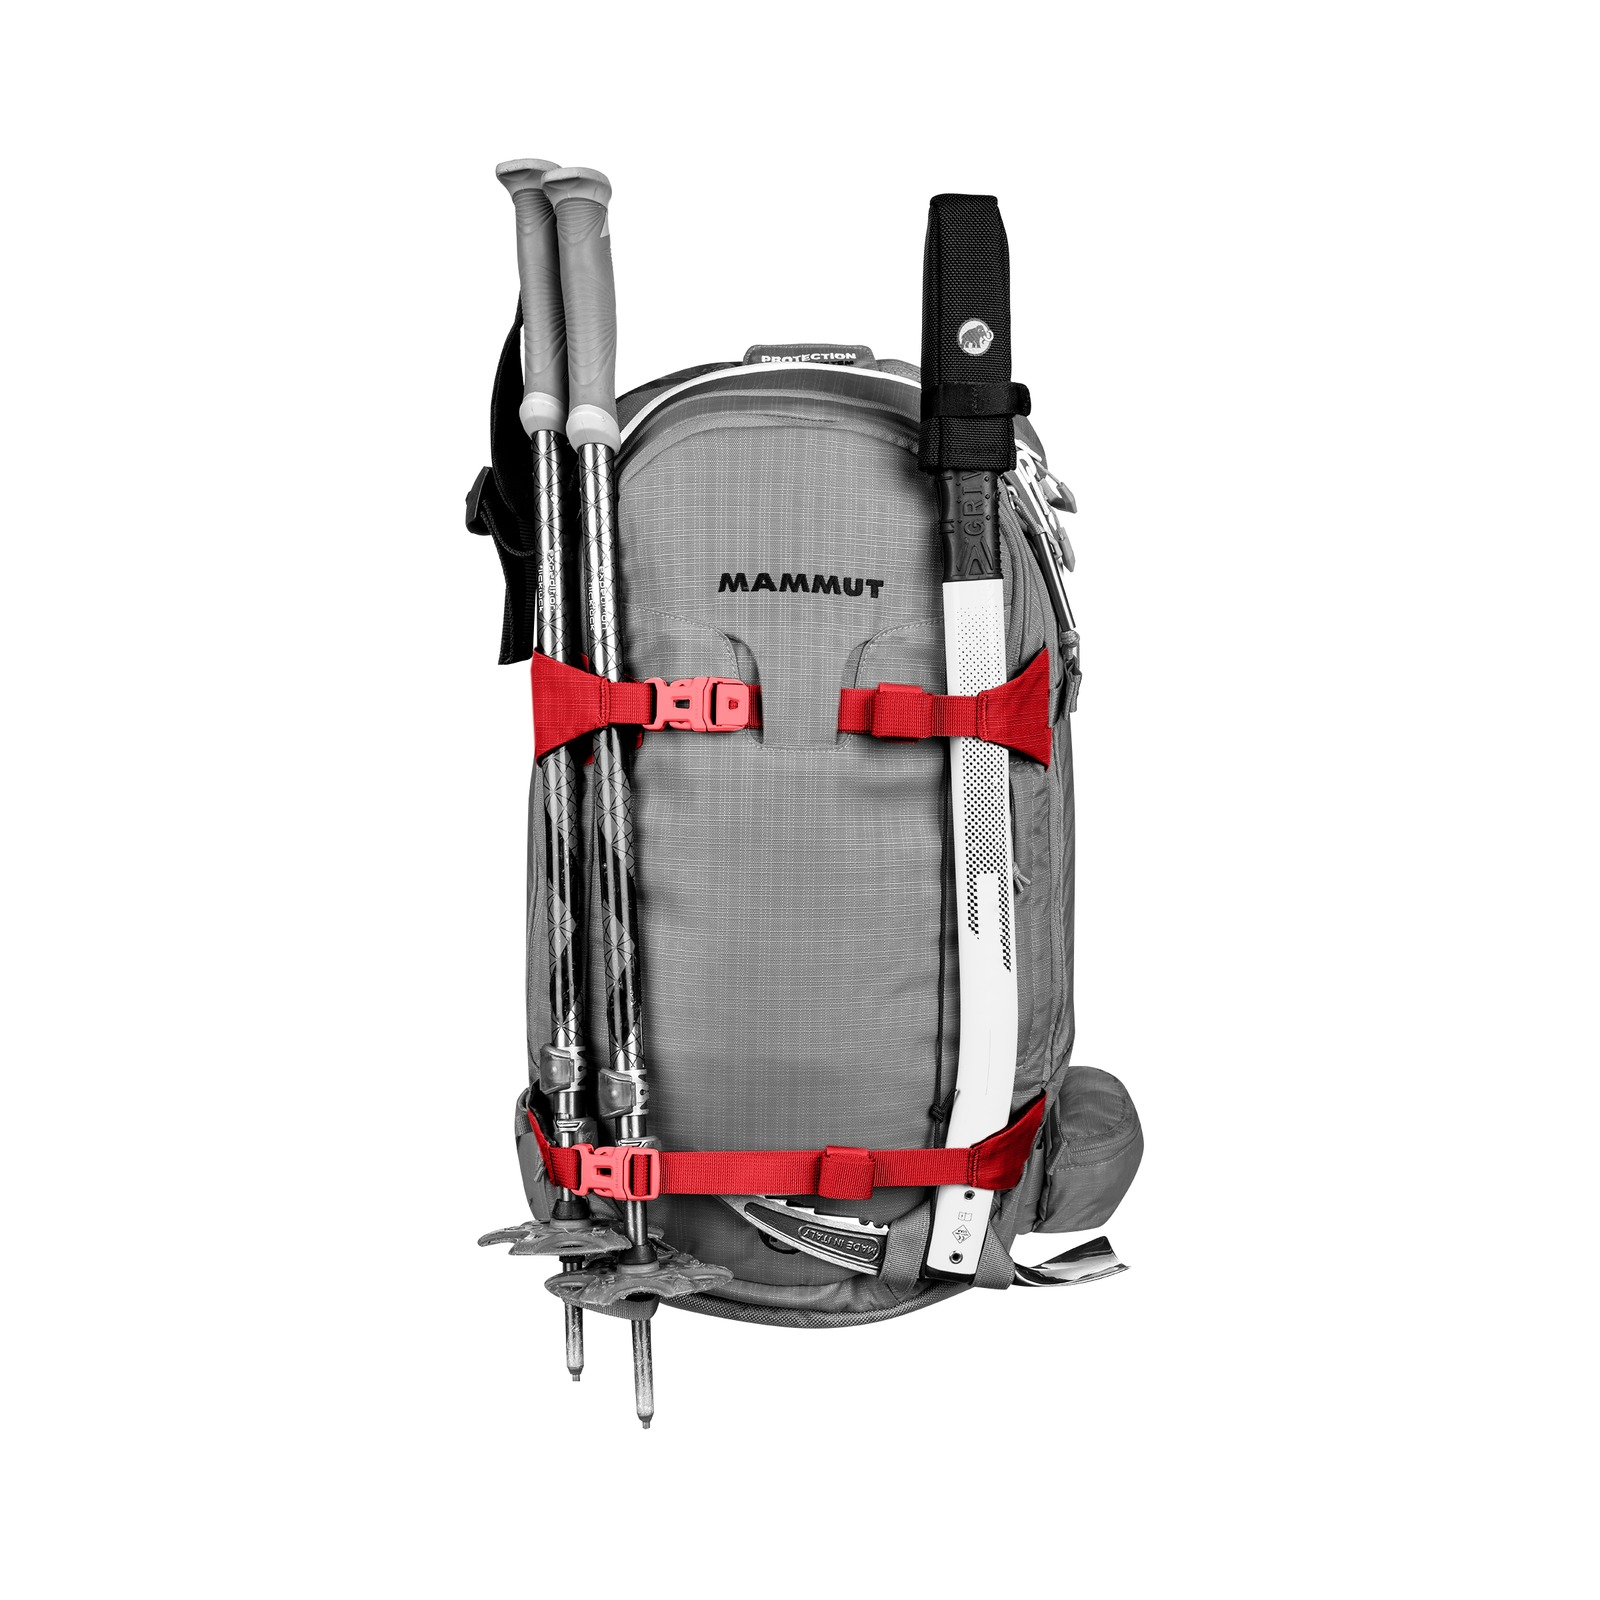 ride-protection-airbag-3-0-10_neutral_det_rgb_1600x1600.jpg